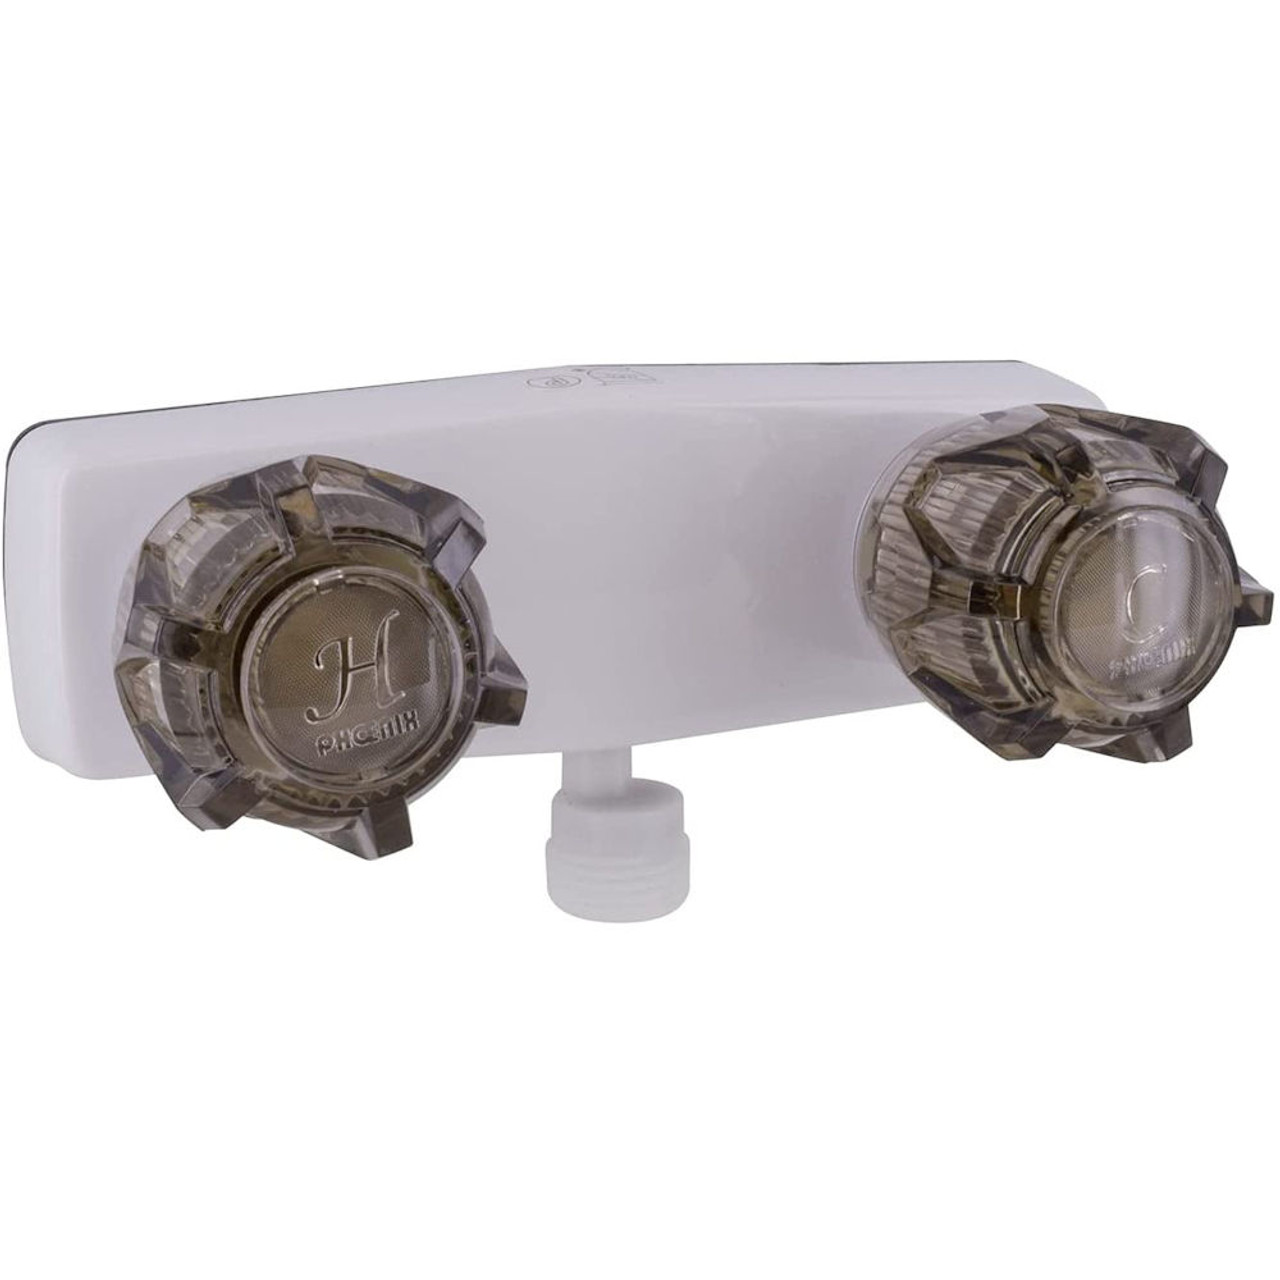 "Phoenix Faucet PF213243 4"" Shower Valve with Vacuum Breaker - White"